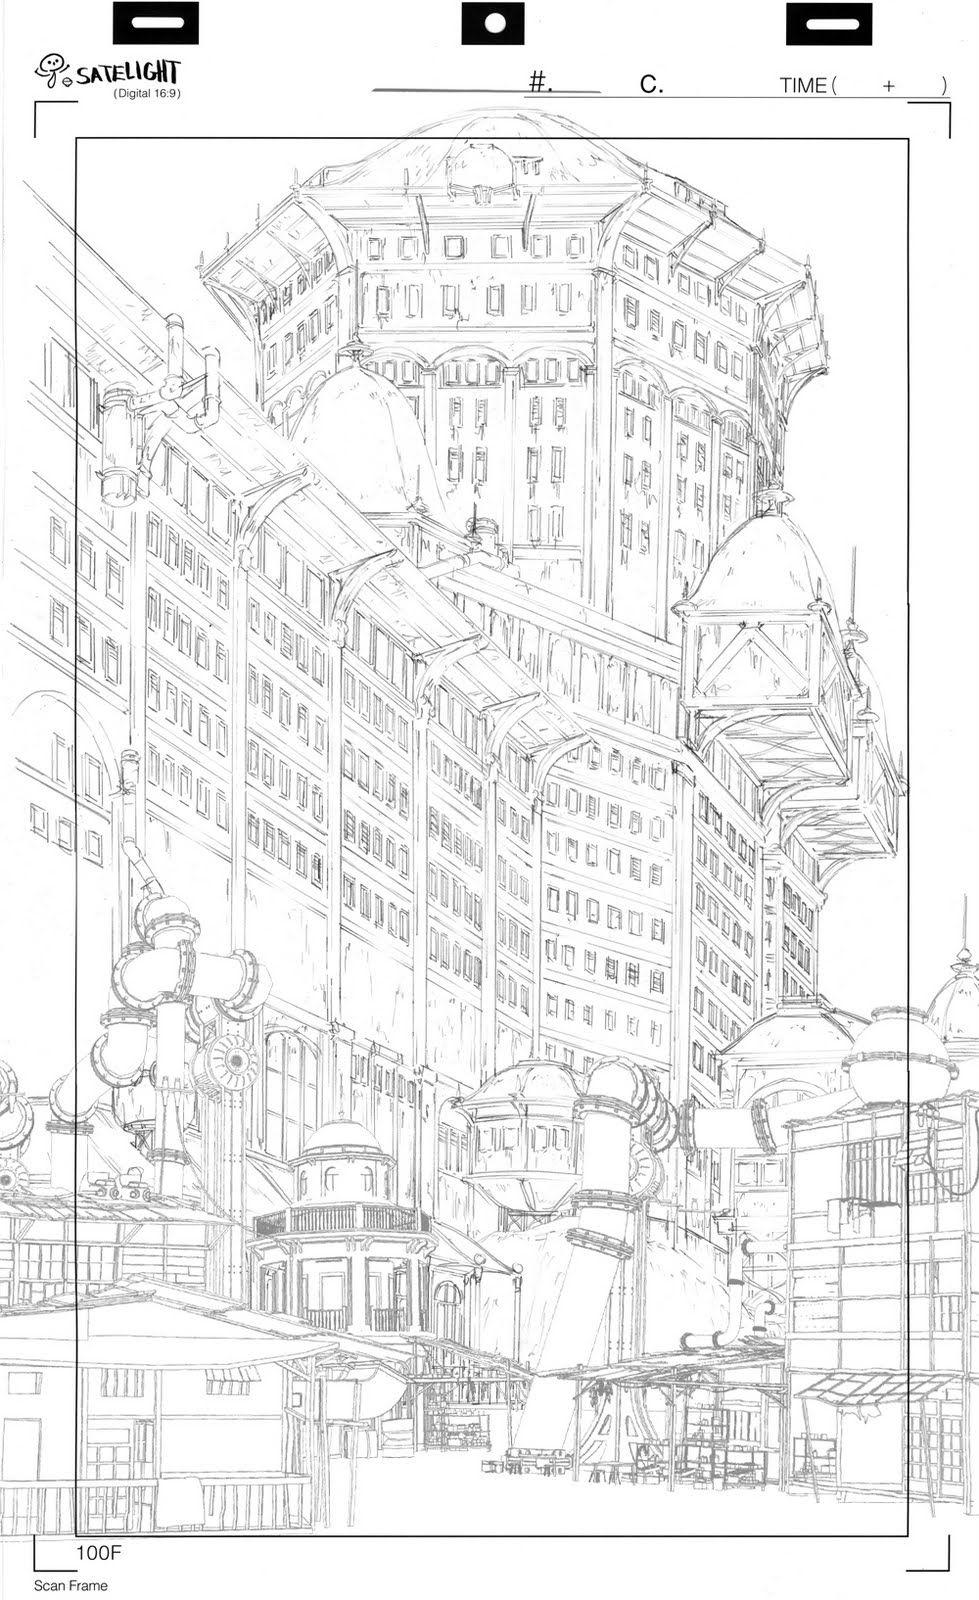 Background Design 背景 設定 街 イラスト 漫画の背景 建築